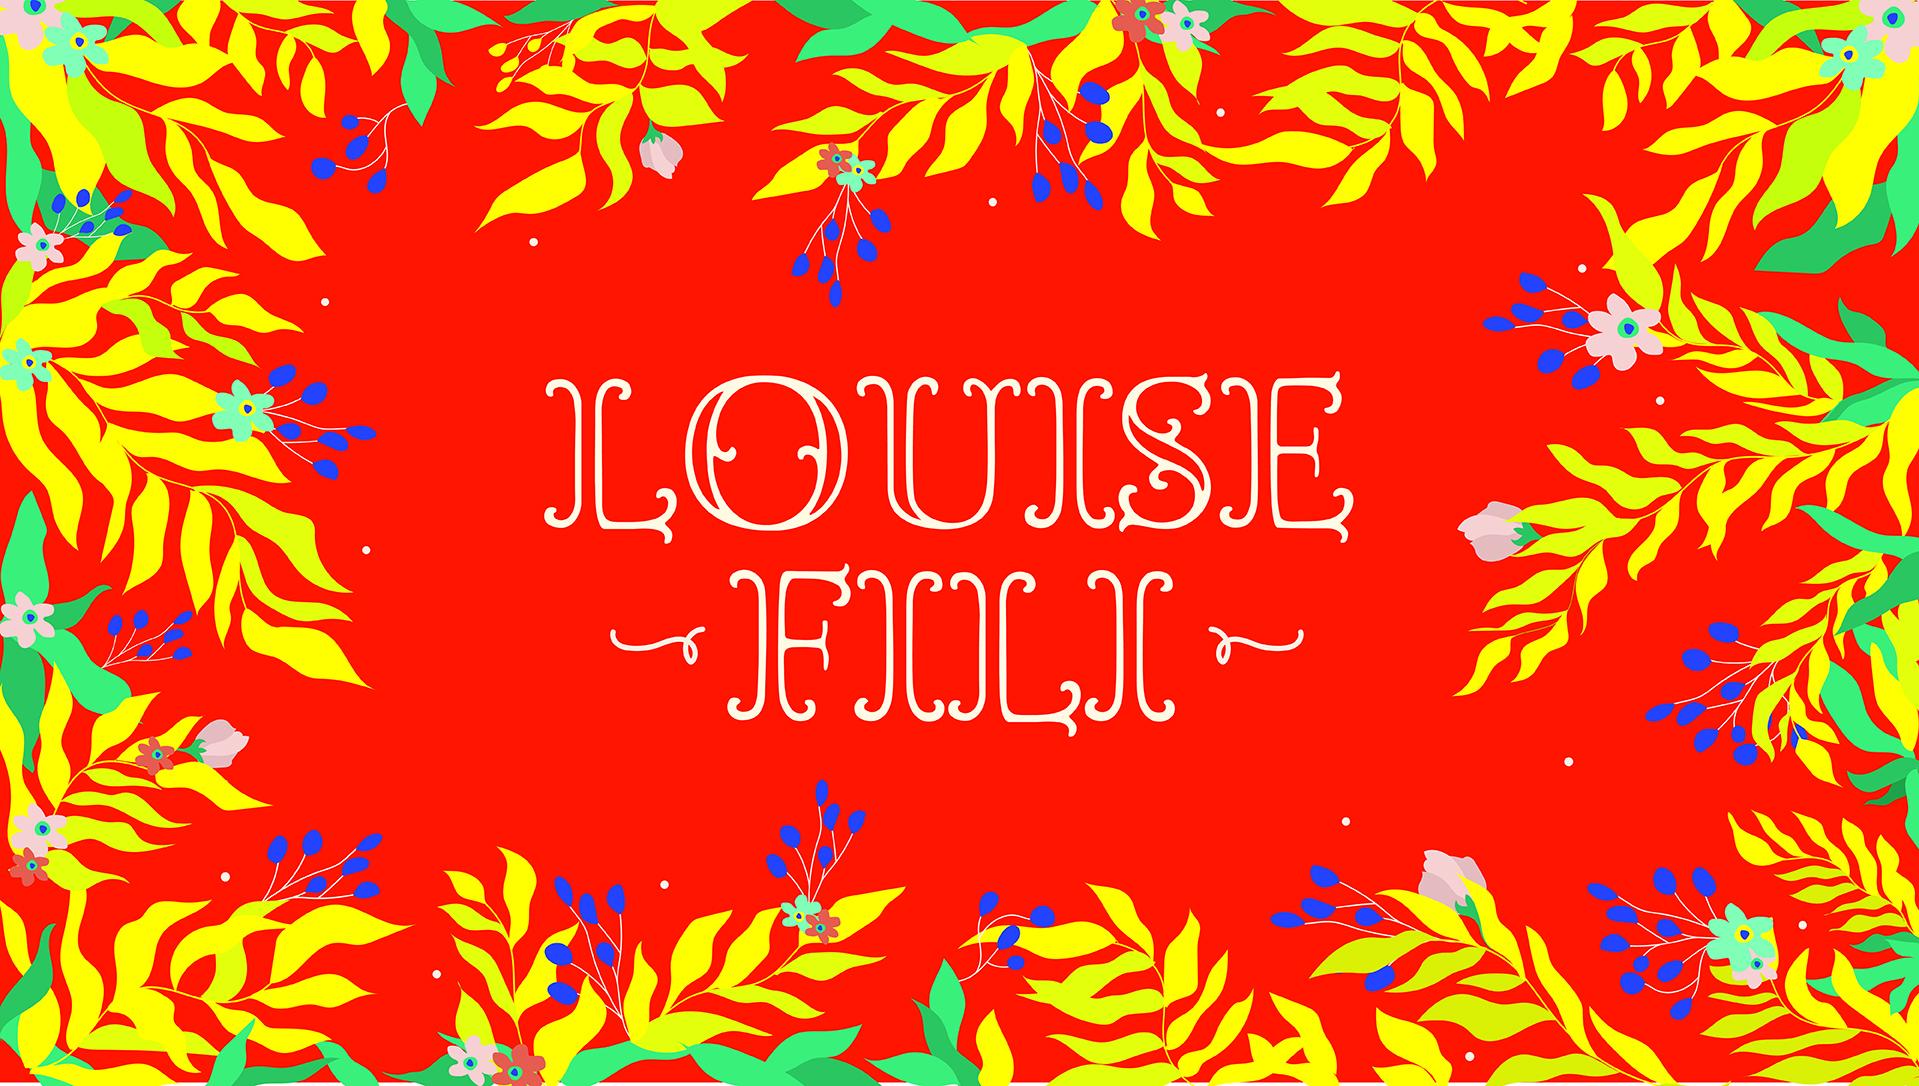 Louise Fili lecture announcement